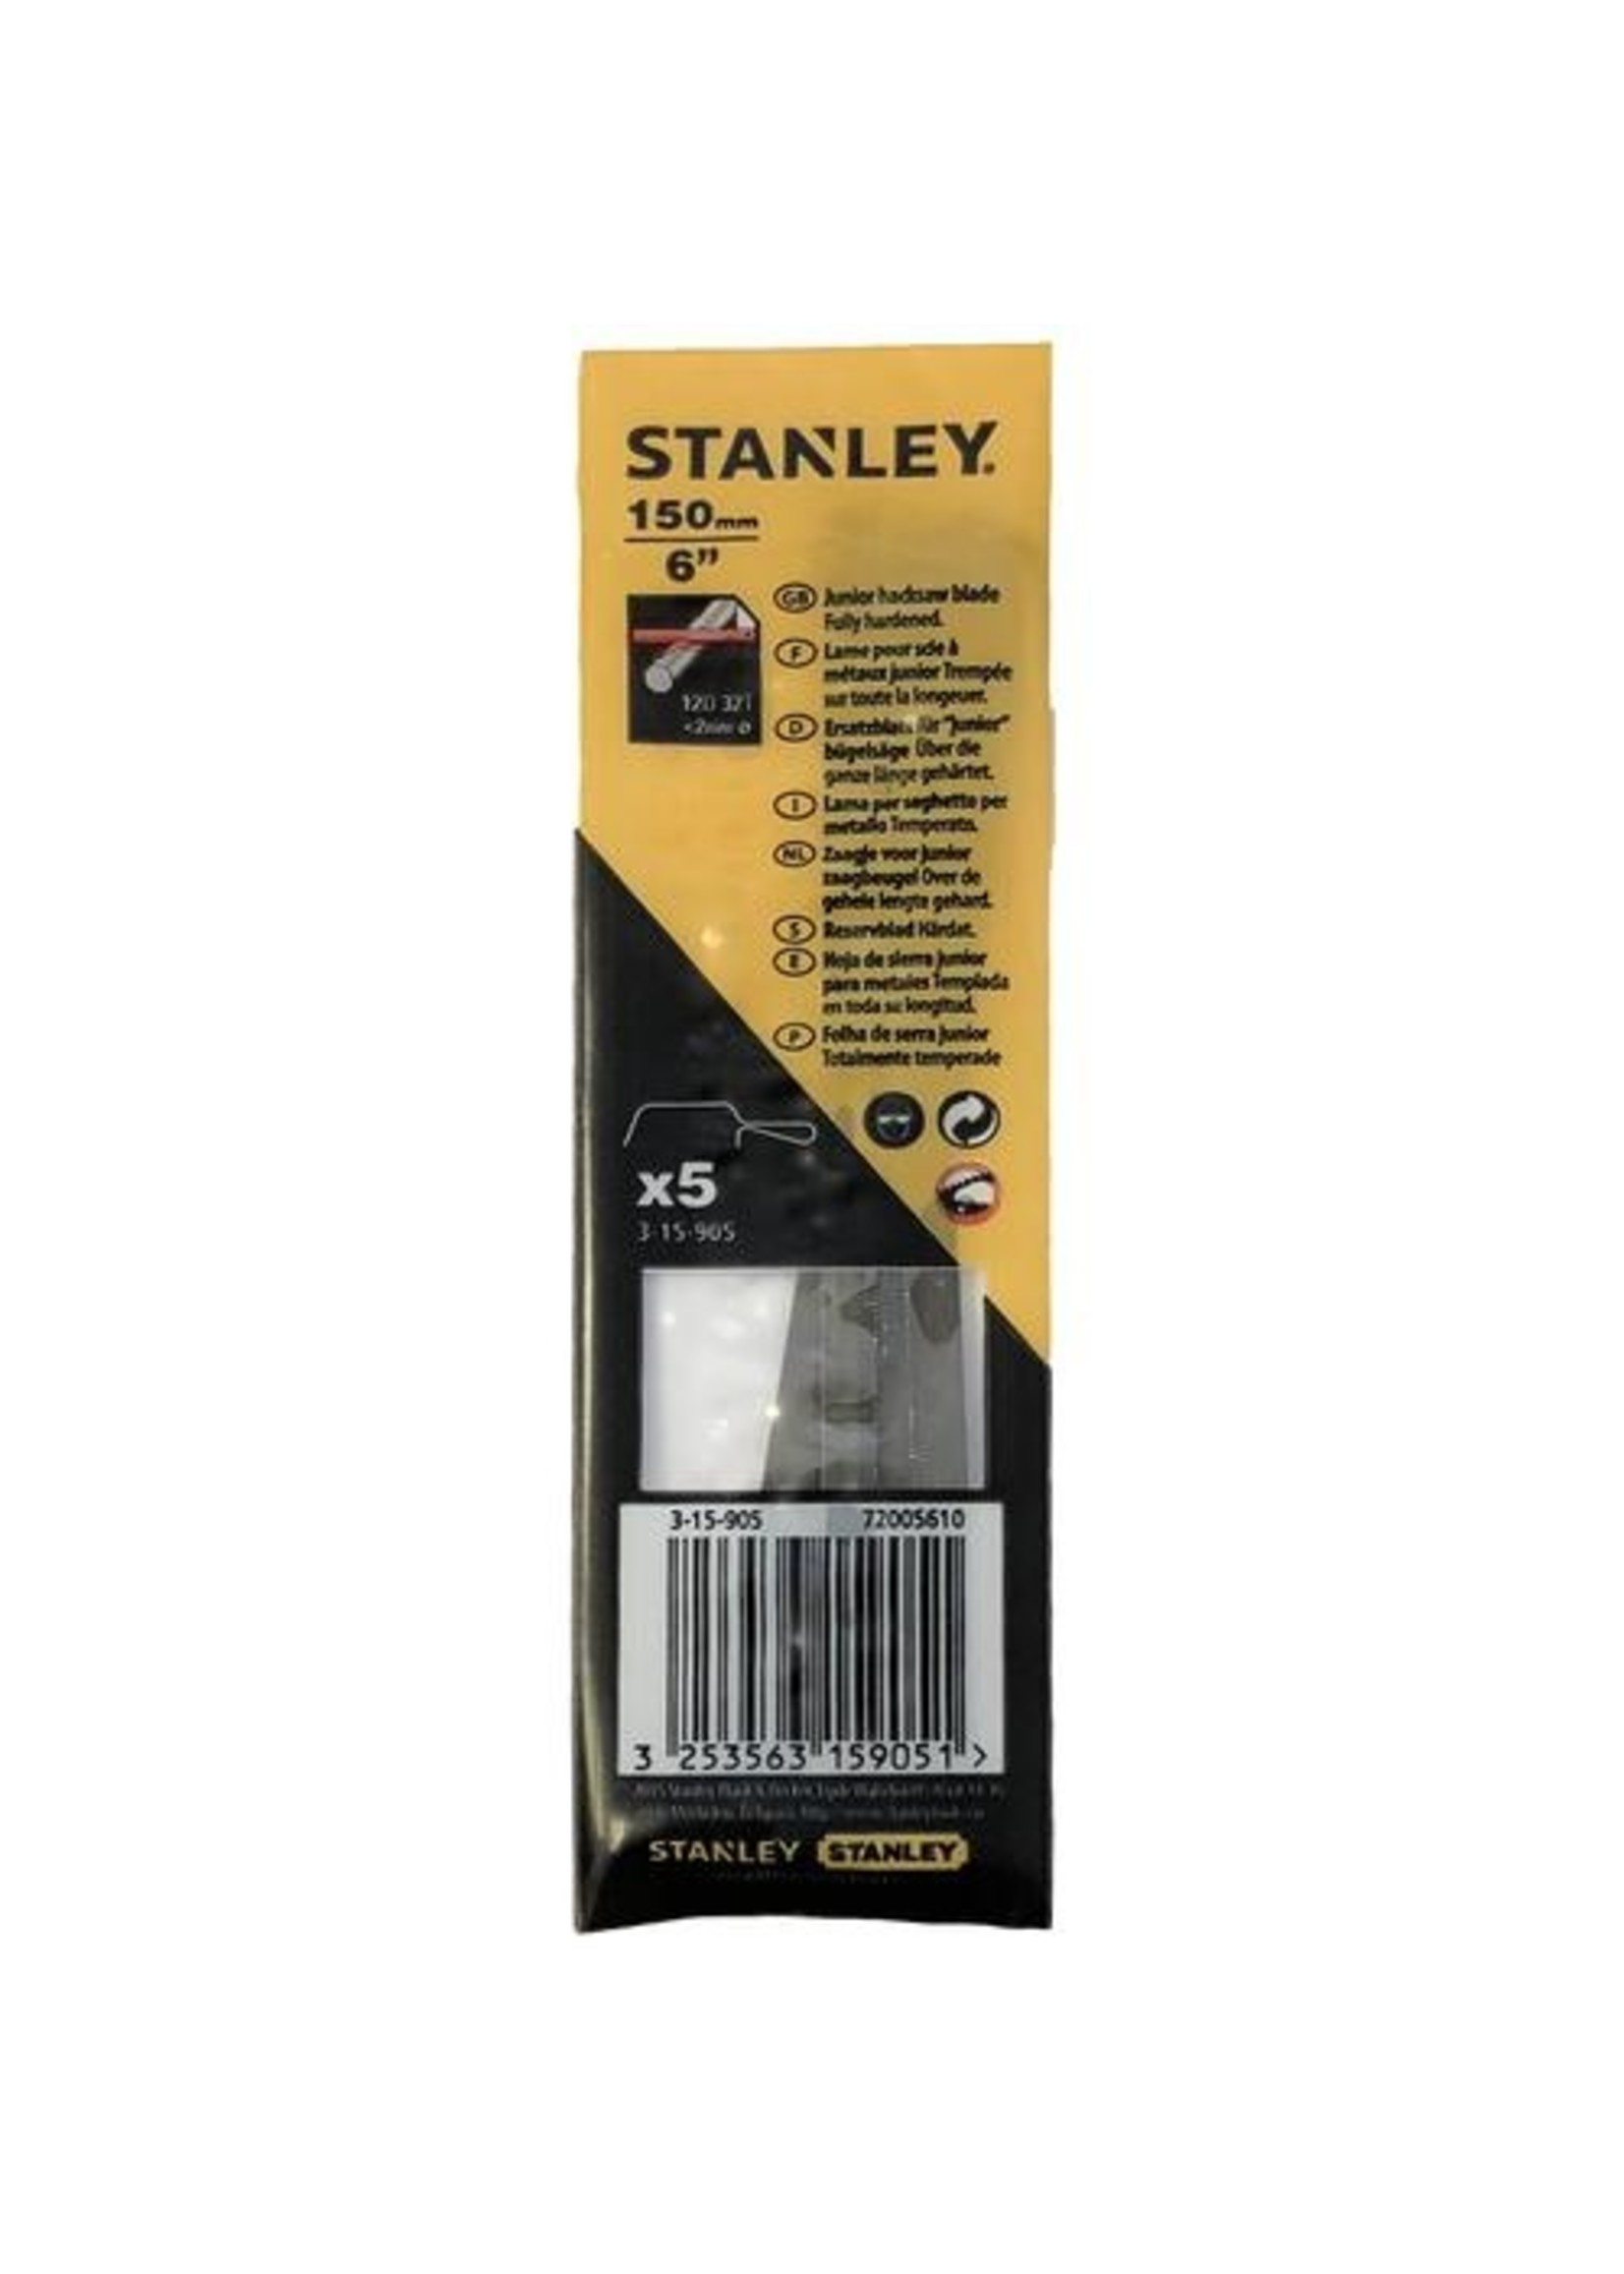 Stanley Stanley - Metaalzaagblad 150mm - 5 stuks/kaart